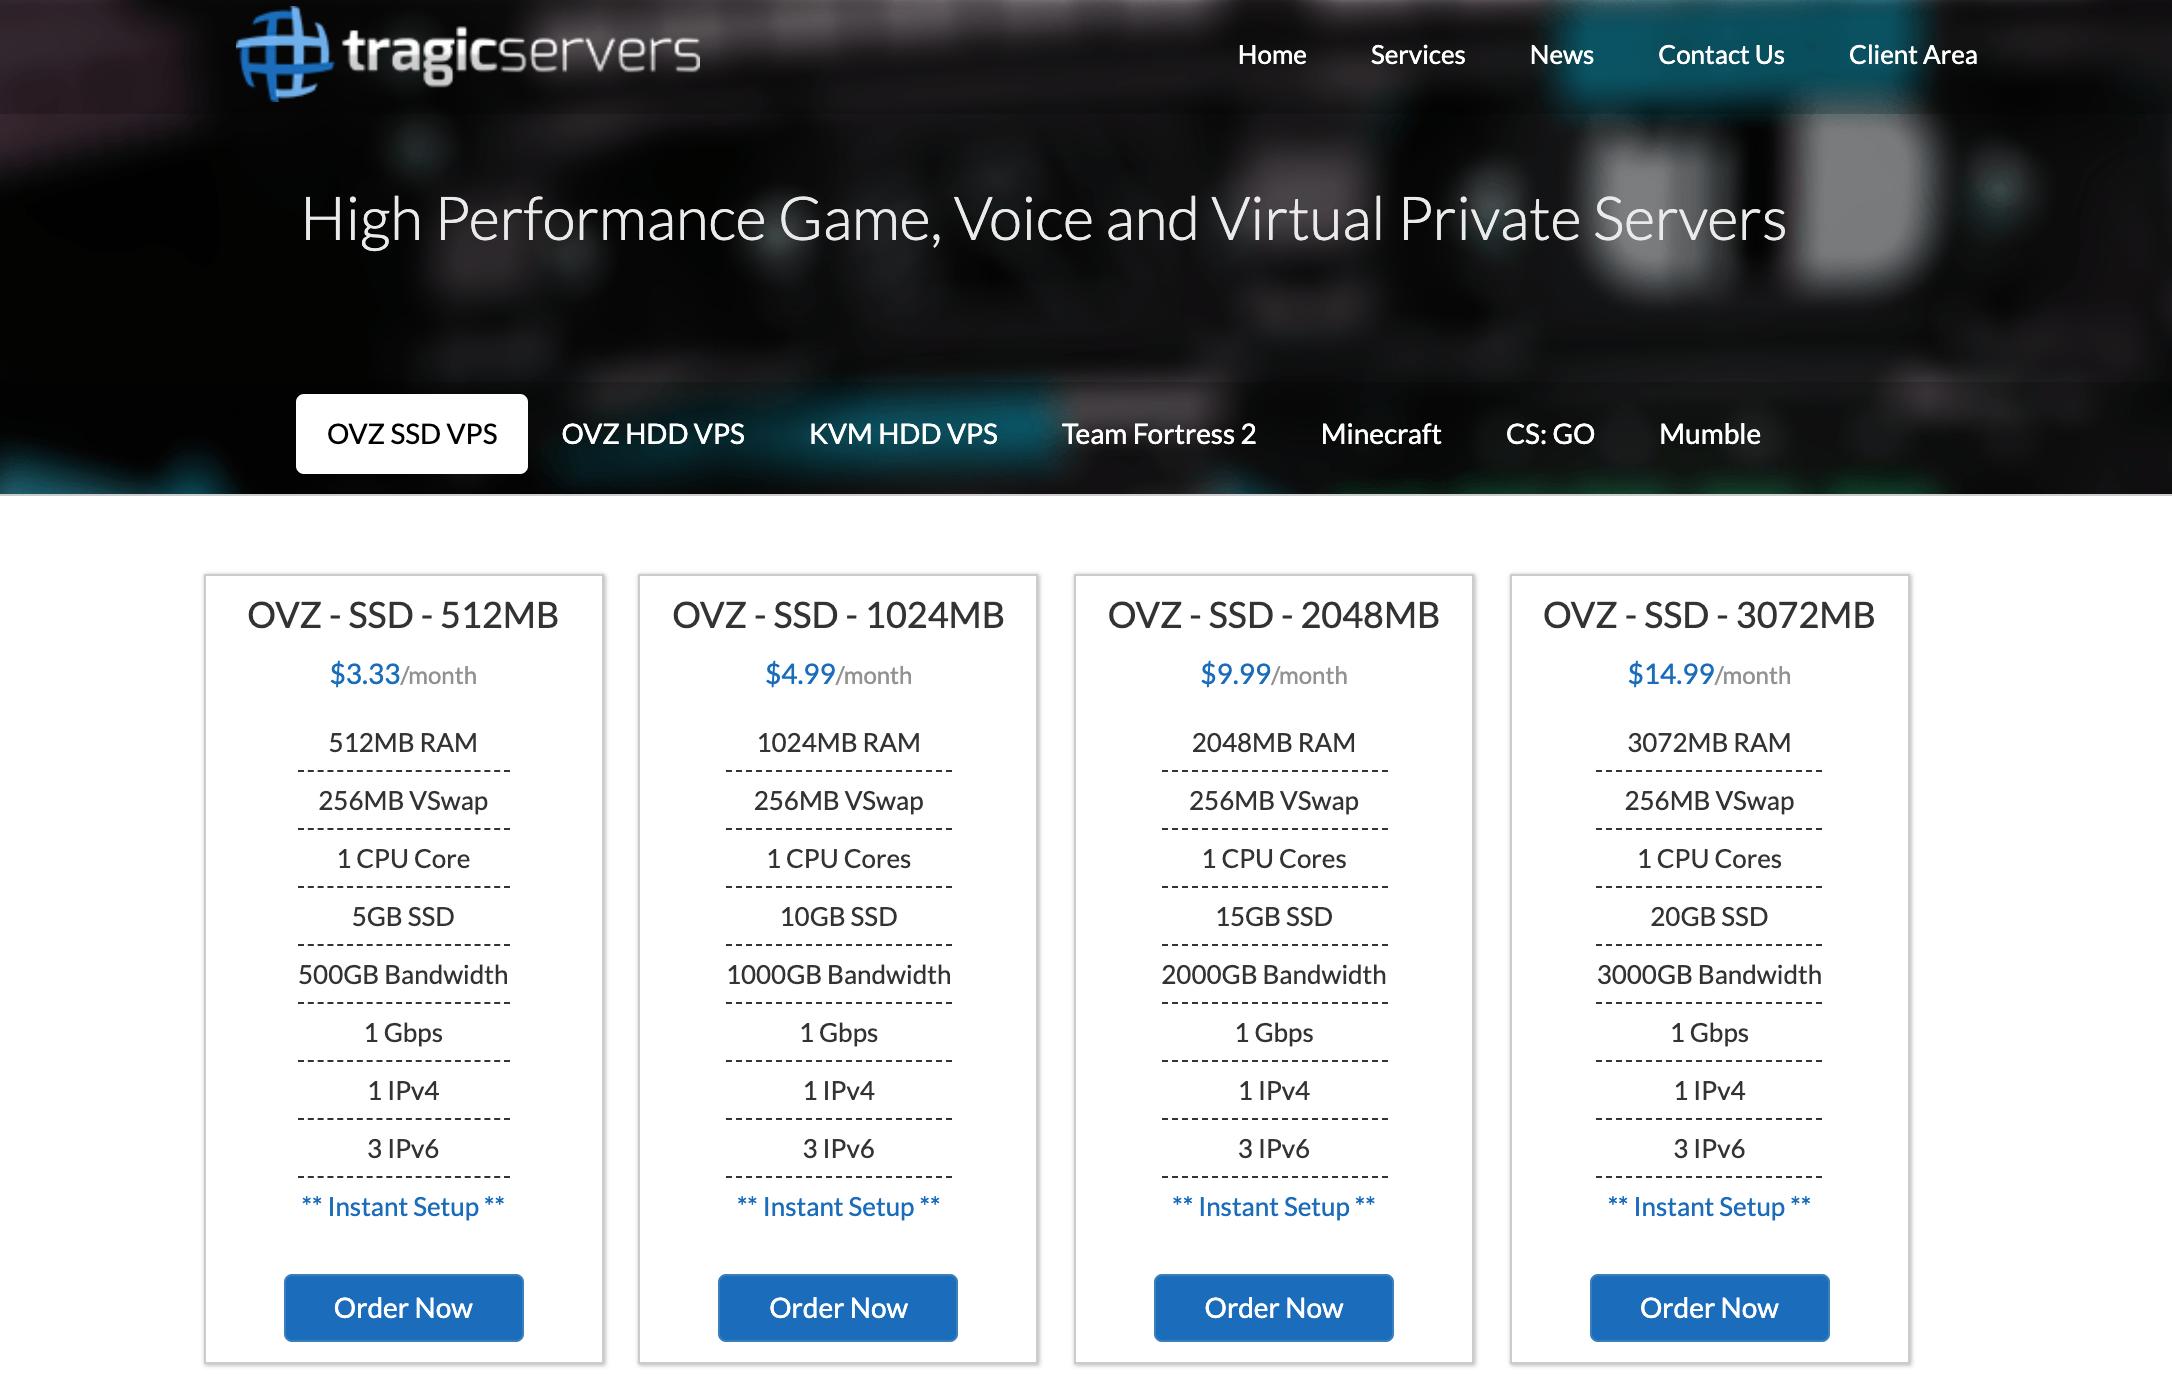 TragicServers 年付14美元洛杉矶OpenVZ VPS,512MB内存,20GB存储,支持IPv6,TragicServers优惠码